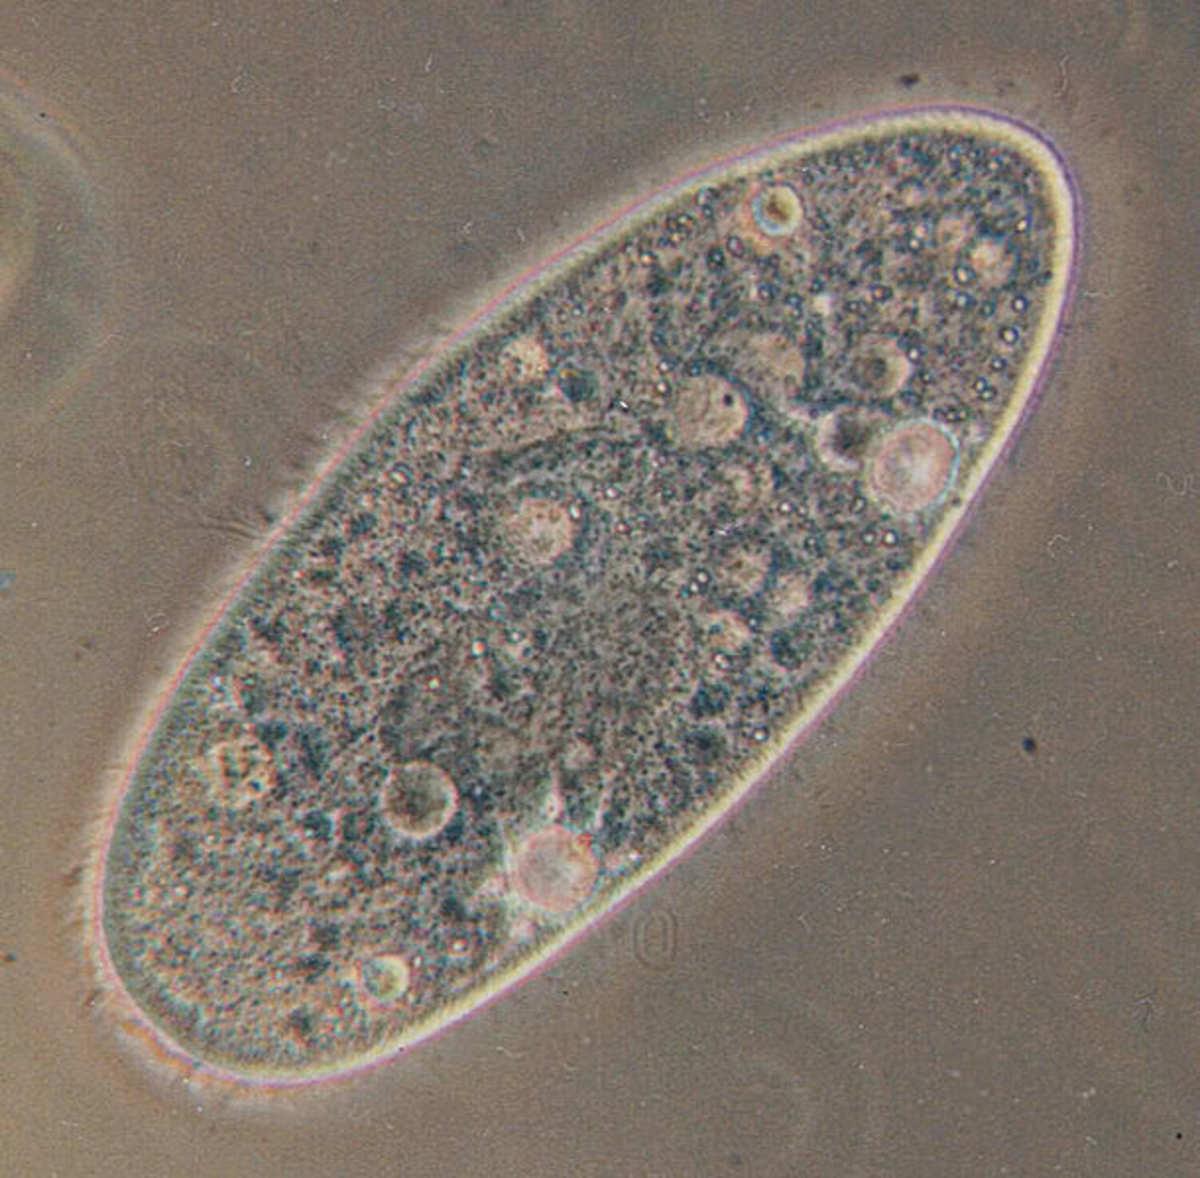 Paramecium - a type of cilate